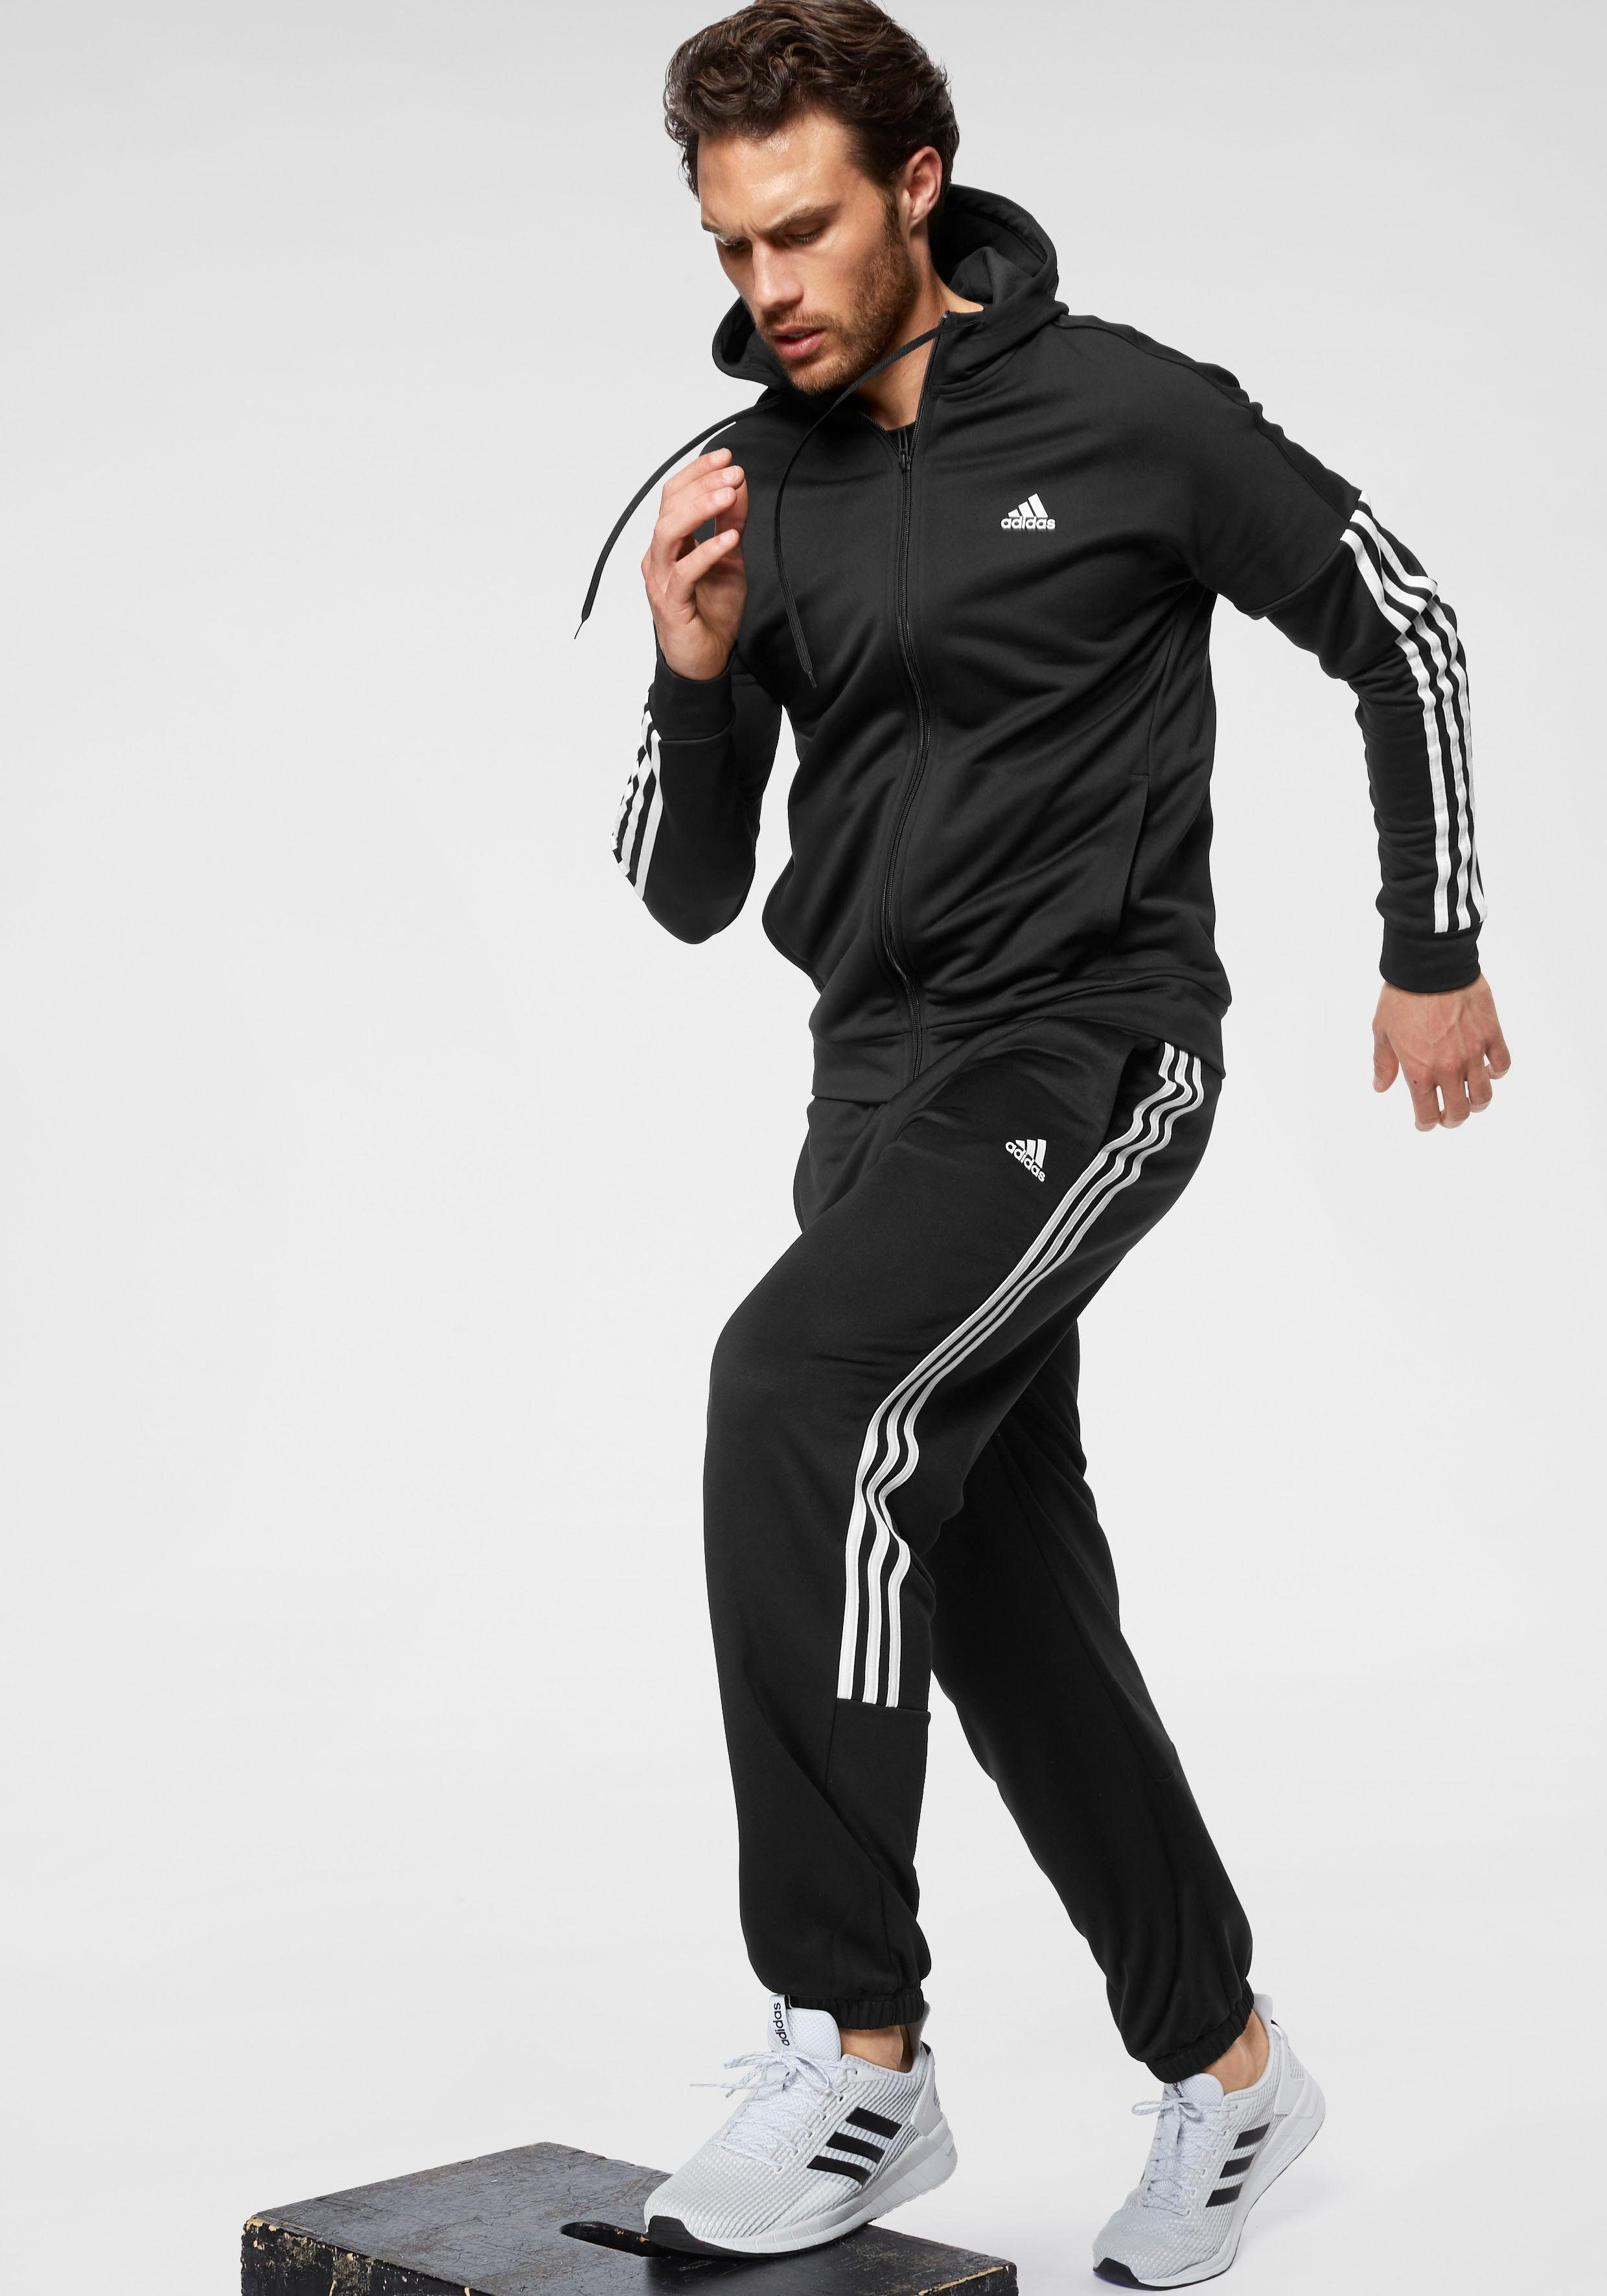 adidas trainingspak vind je bij | OTTO